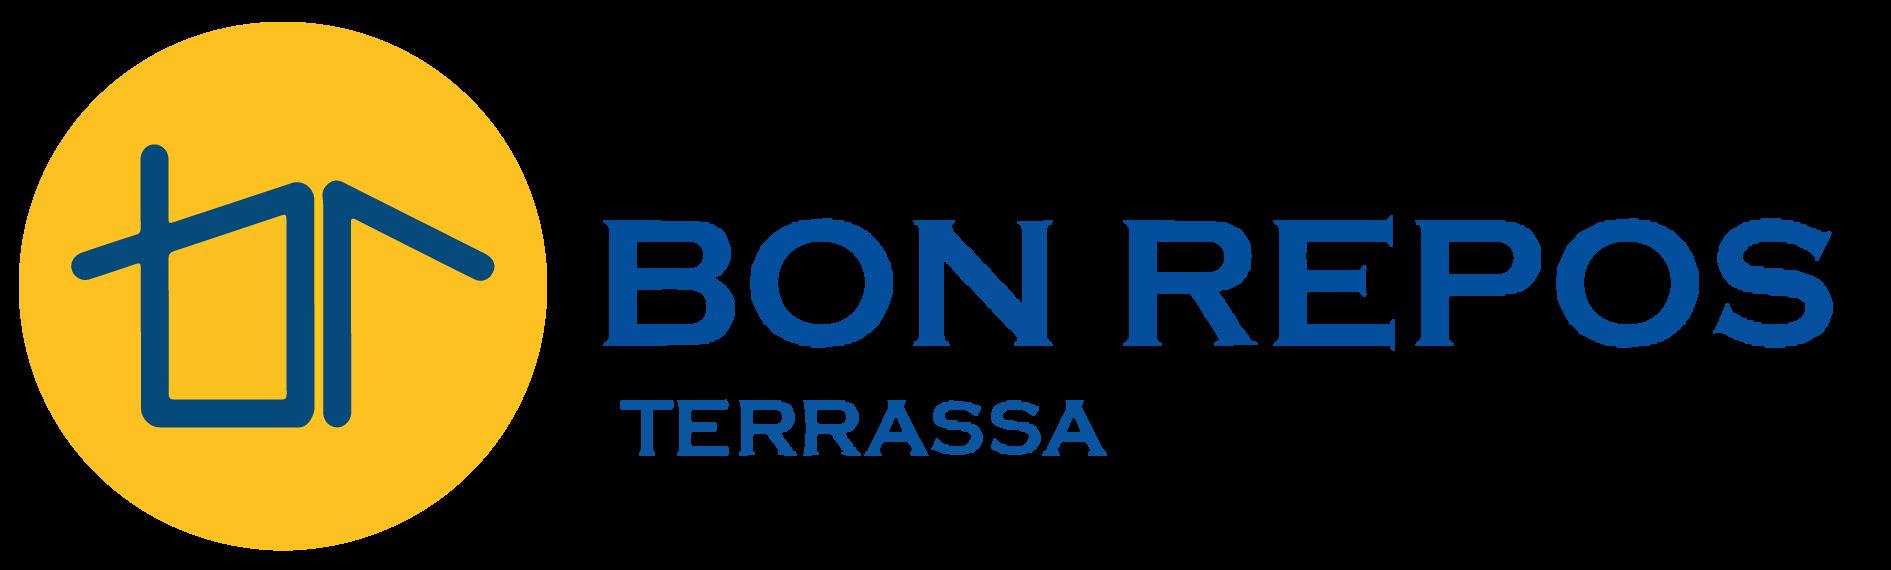 Residència BON REPÒS, TERRASSA